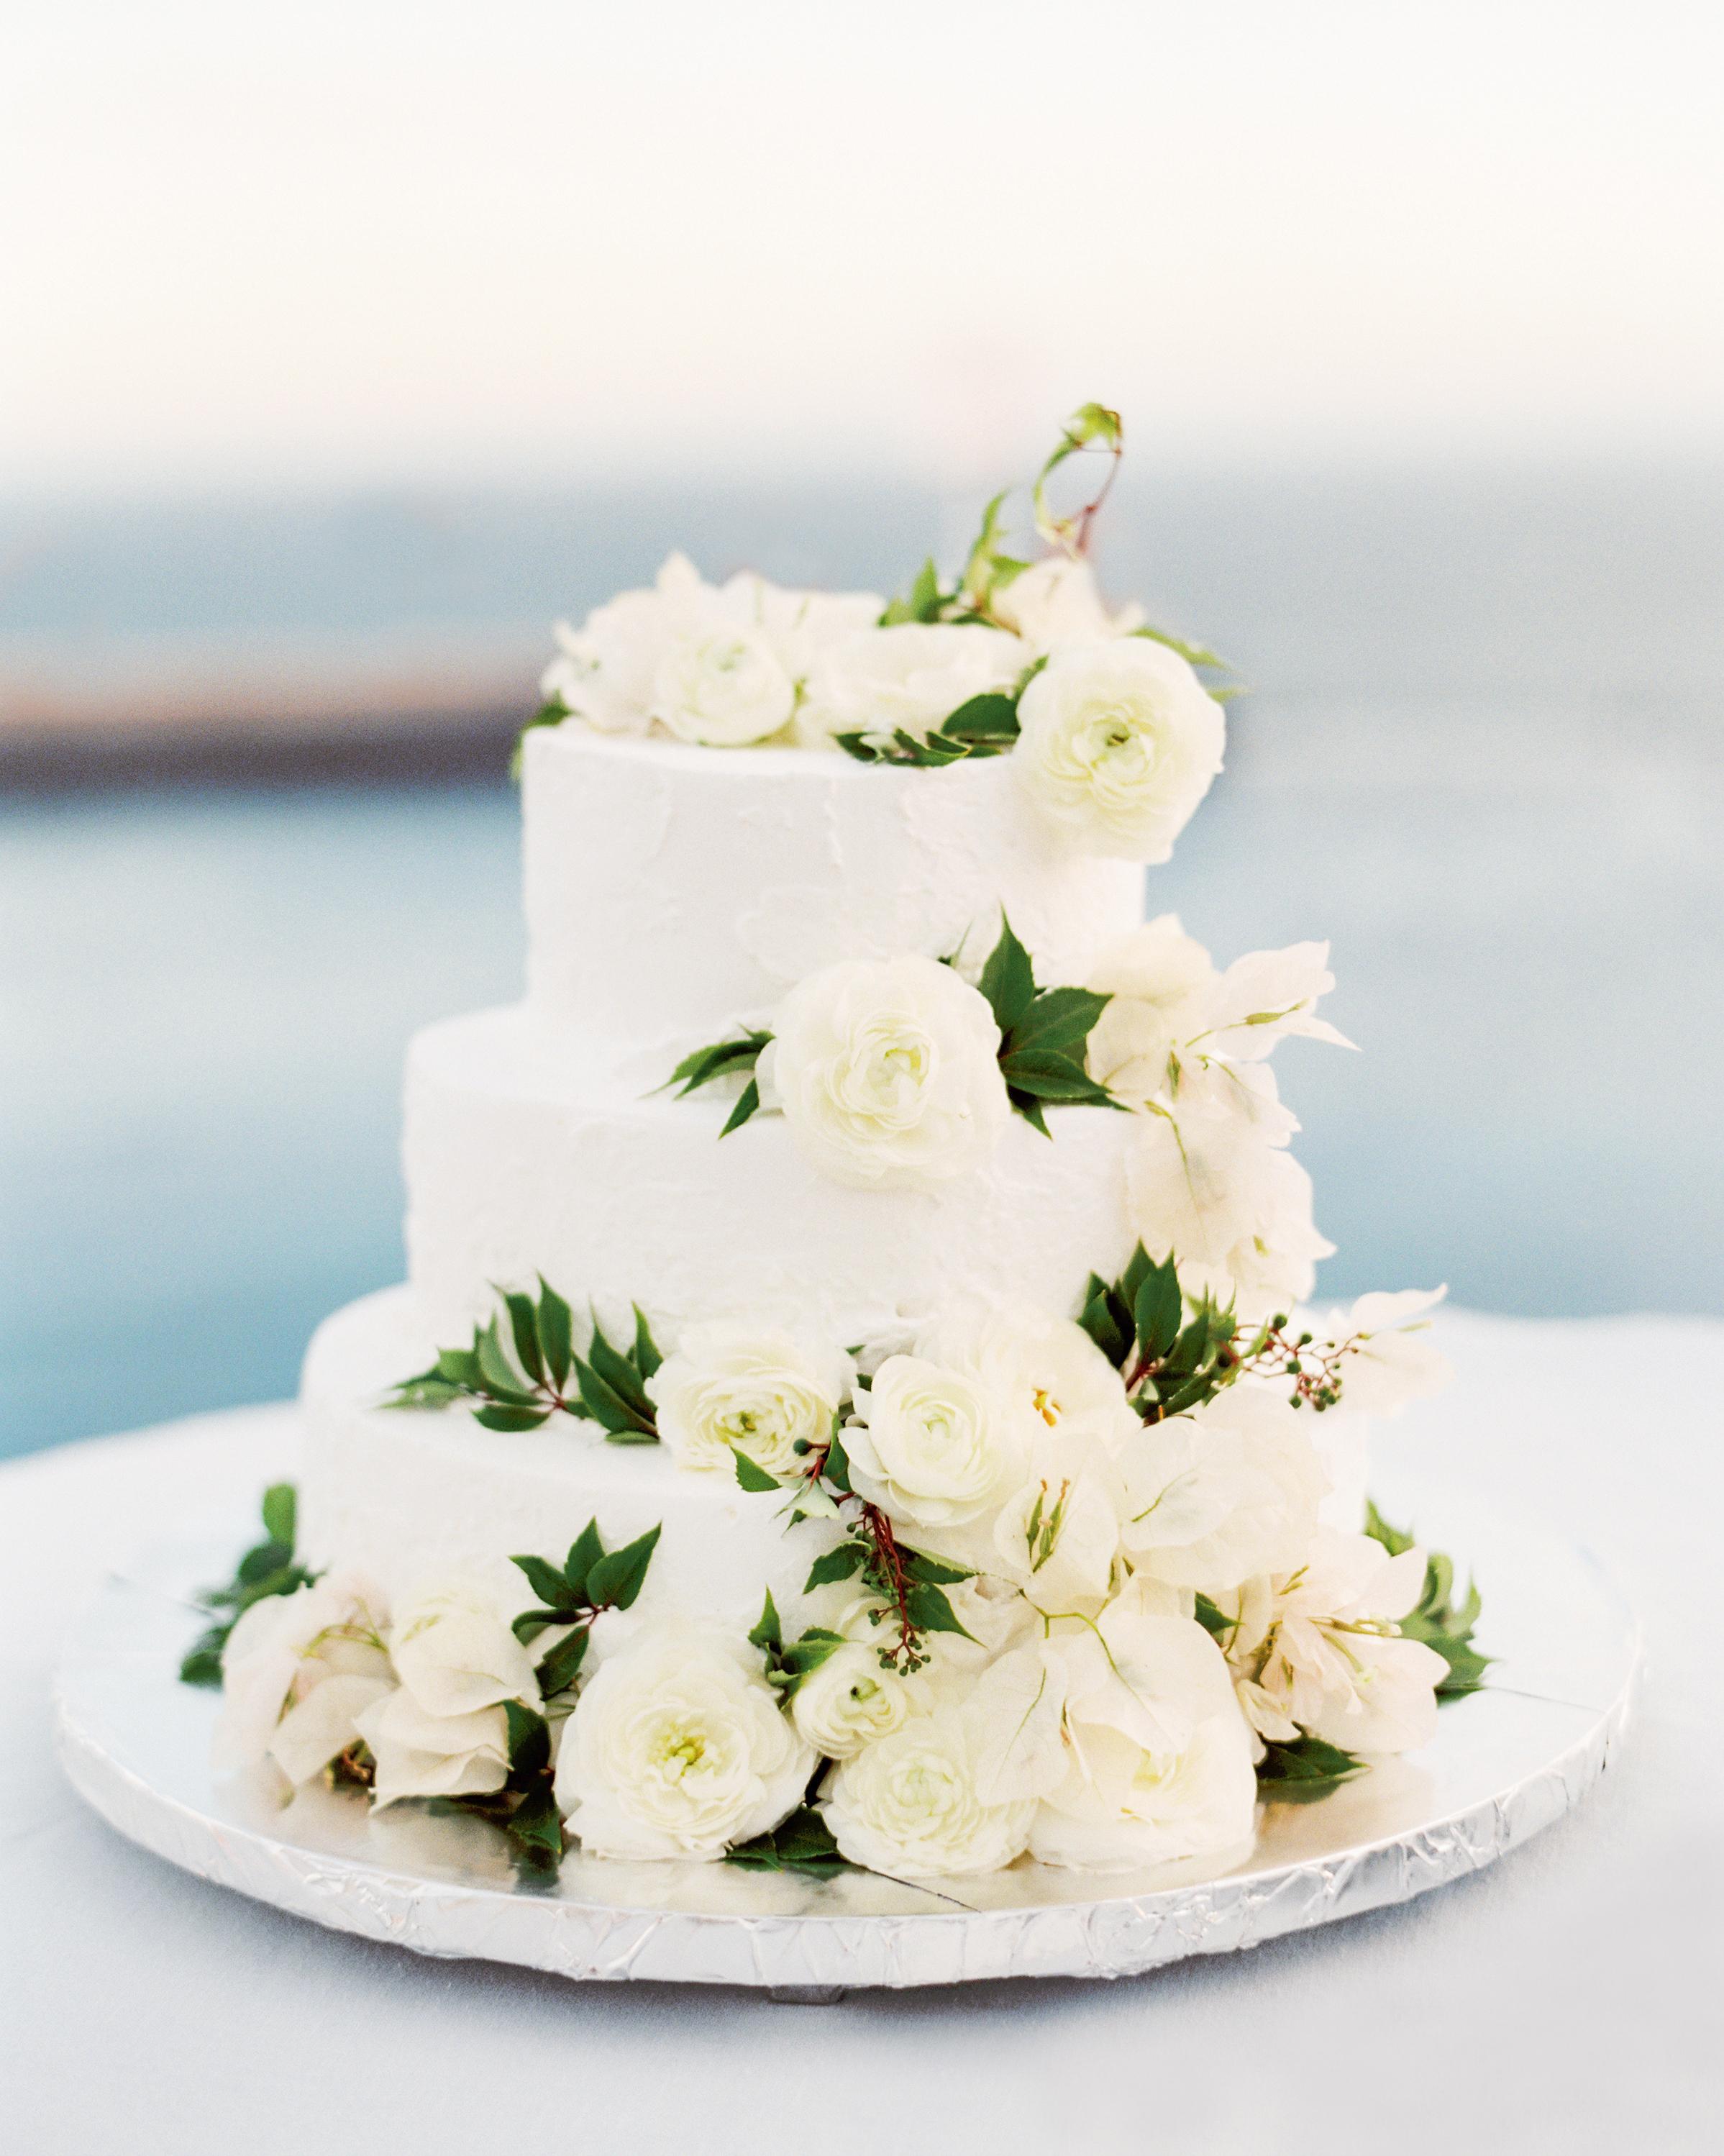 megan-jeremy-wedding-cake-91-s112680-0216.jpg